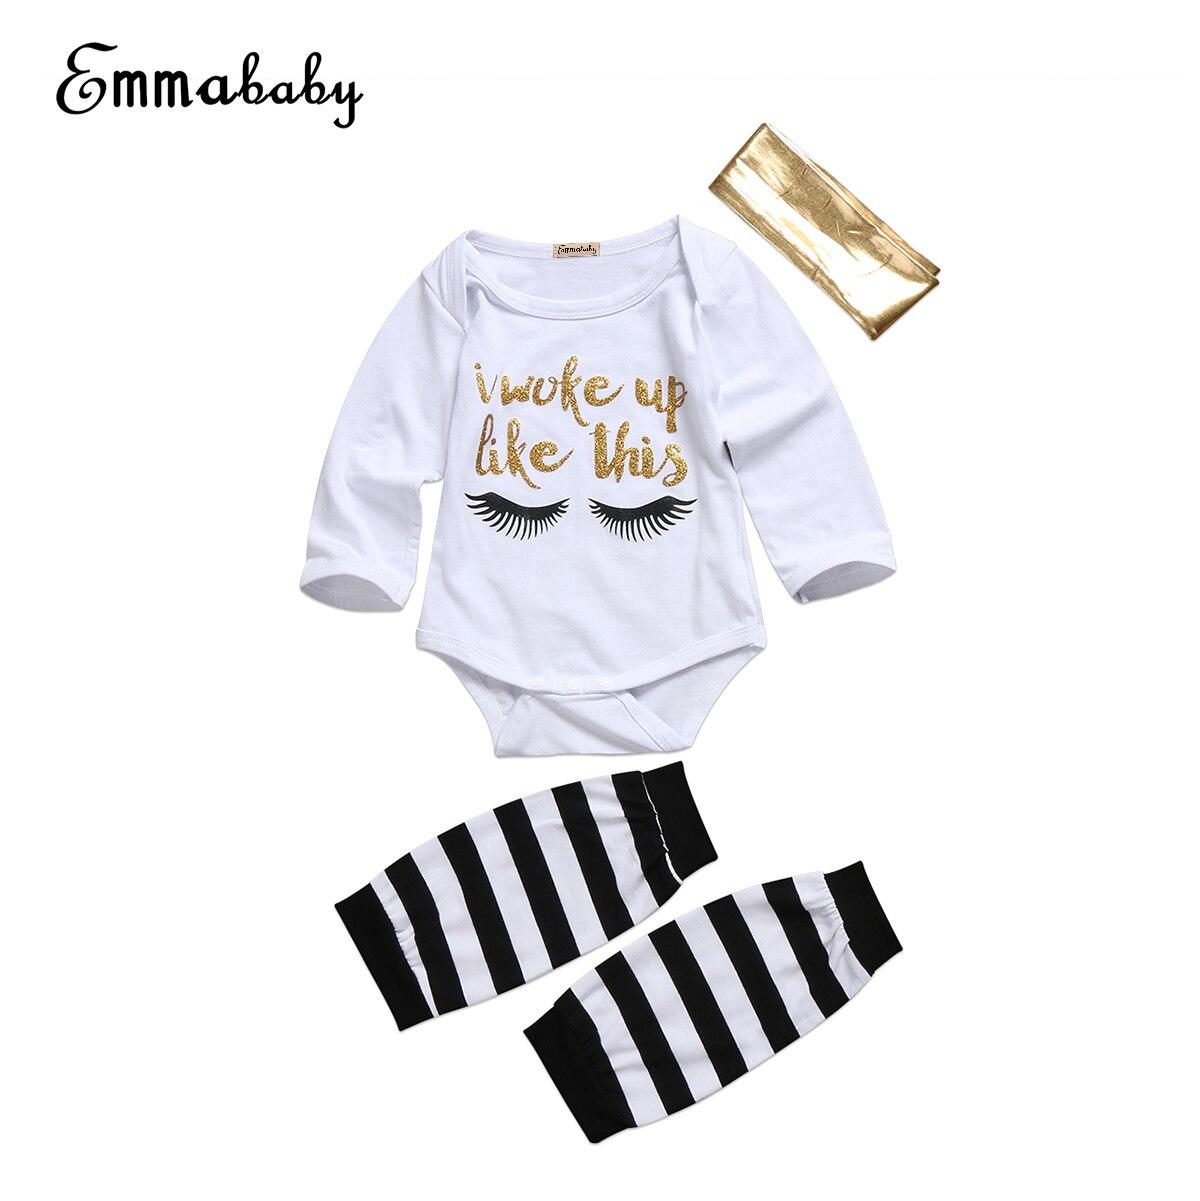 3PCS Lovely Baby Set Newborn Baby Girls Clothes Long Sleeve Bodysuit Jumpsuit Outfits Headband Leg Warmer Cute Kid Clothes Set